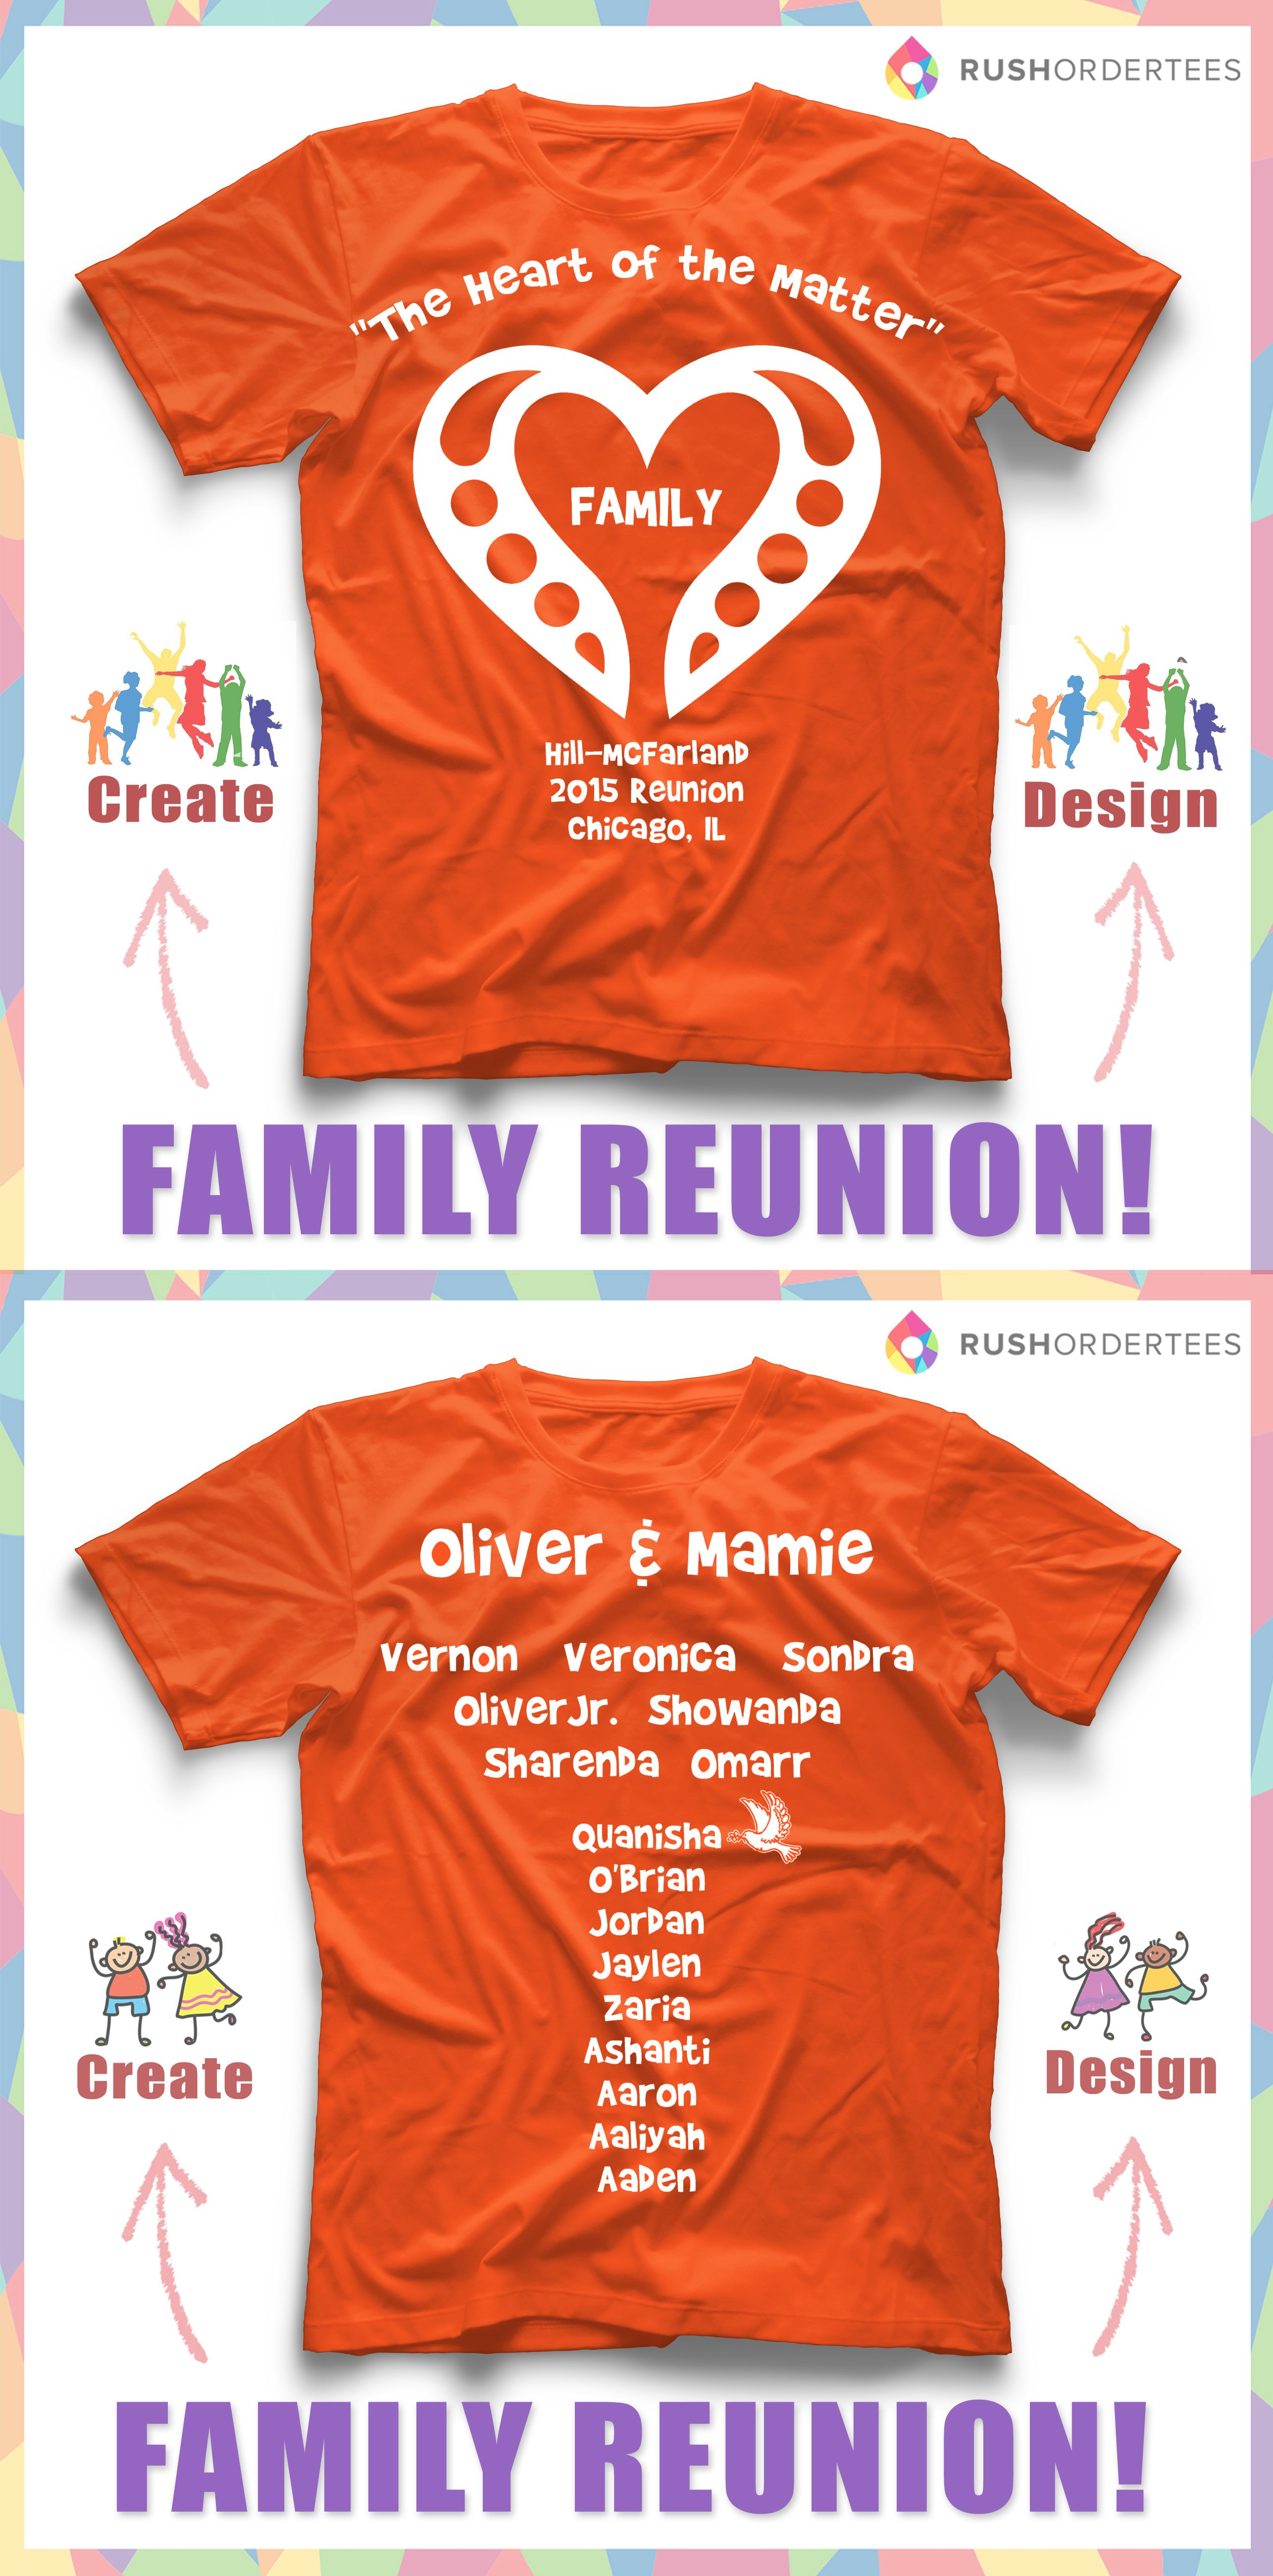 Design tshirt reunion - Love This Family Reunion Custom T Shirt Design Idea Create And Design Custom Shirts